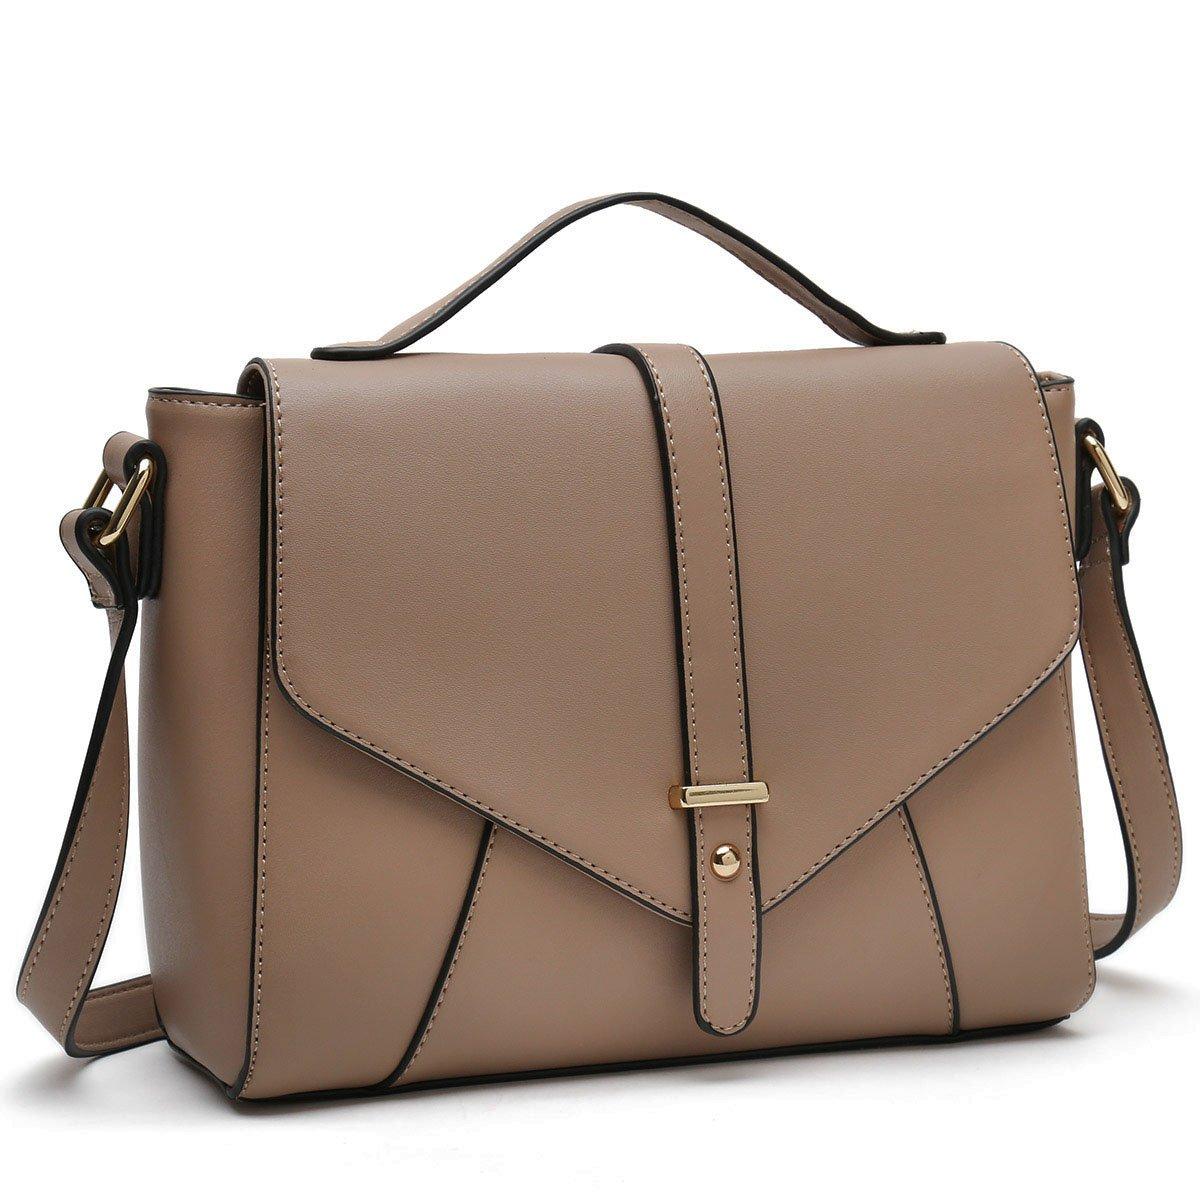 YMNHNB Medium Sized Crossbody Purses Ladies Designer Shoulder Bags for Women Handbags (Khaki)